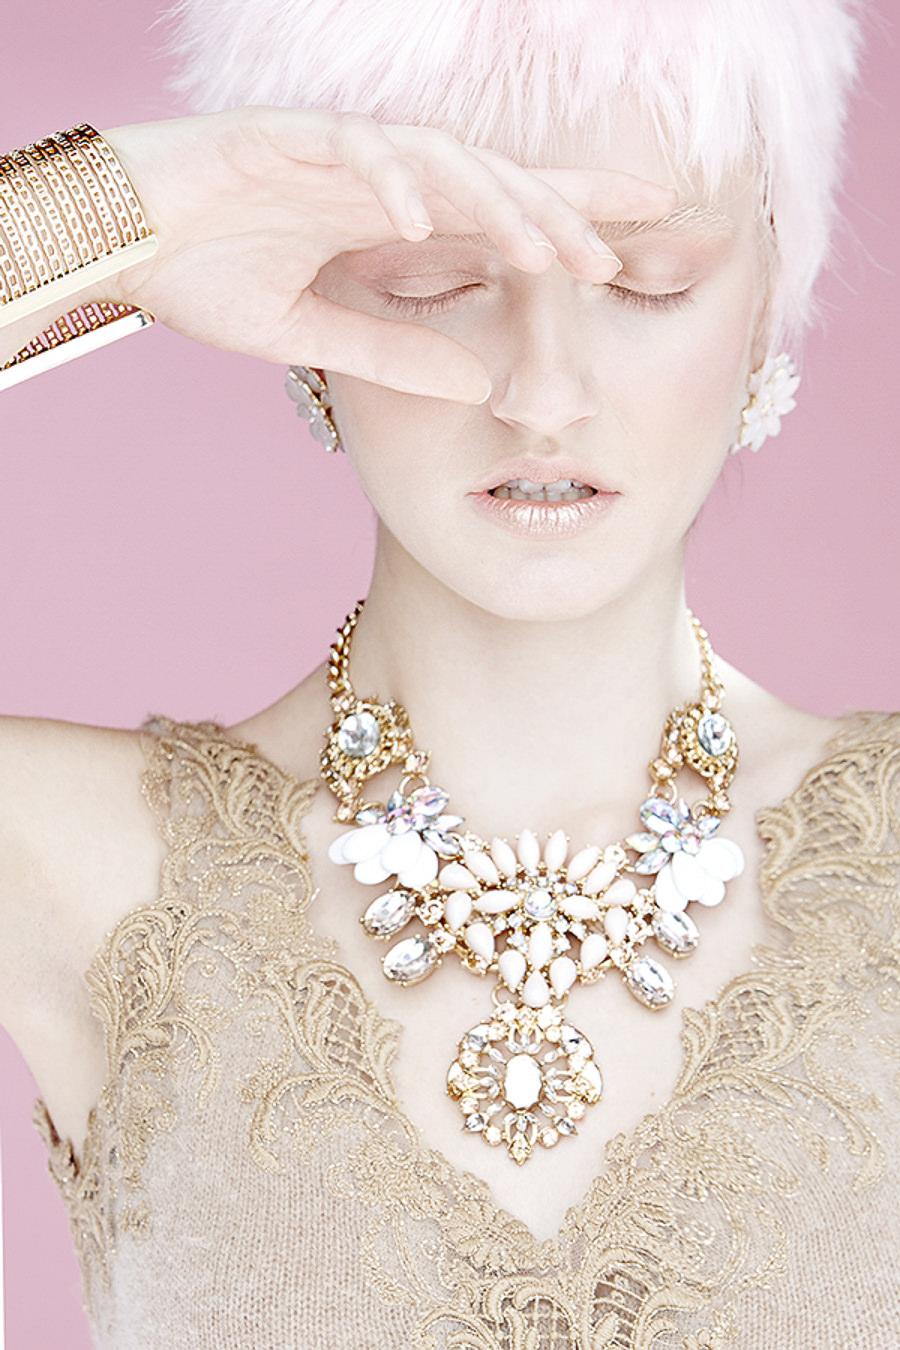 In the Pink Moonlight by Diliana Florentin and Antoniya Yordanova